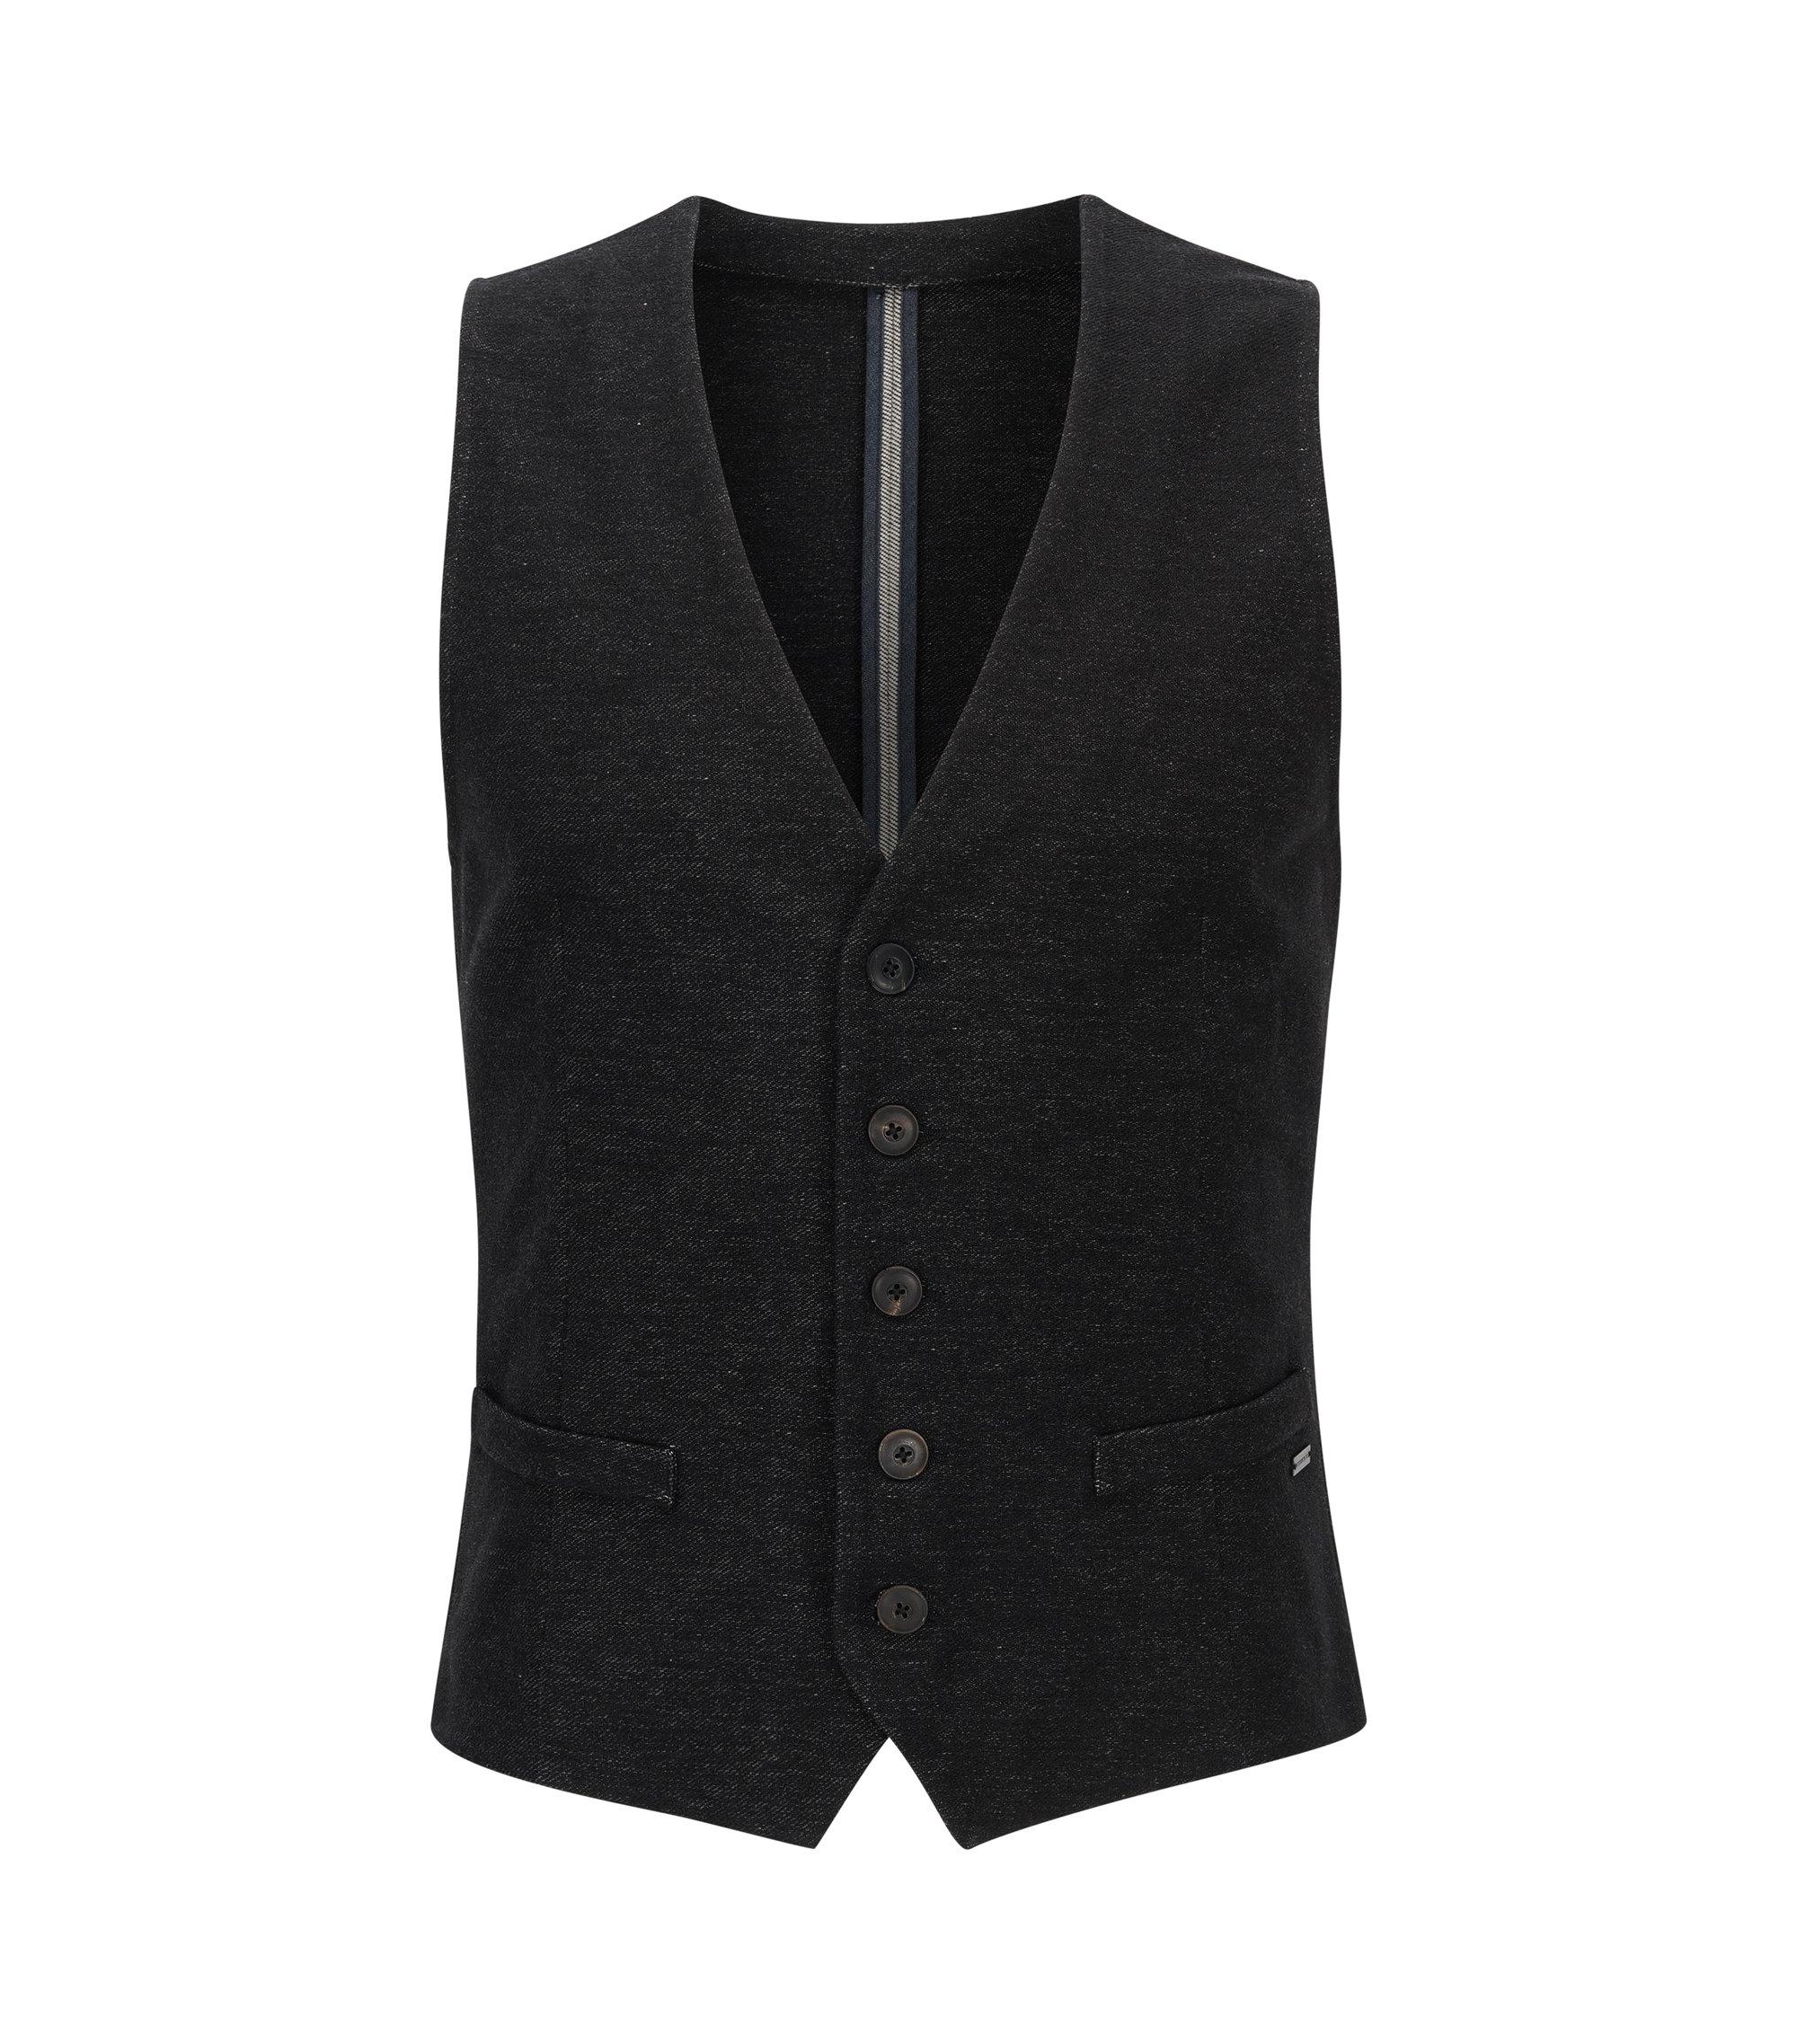 Slim-fit waistcoat in denim jersey, Black